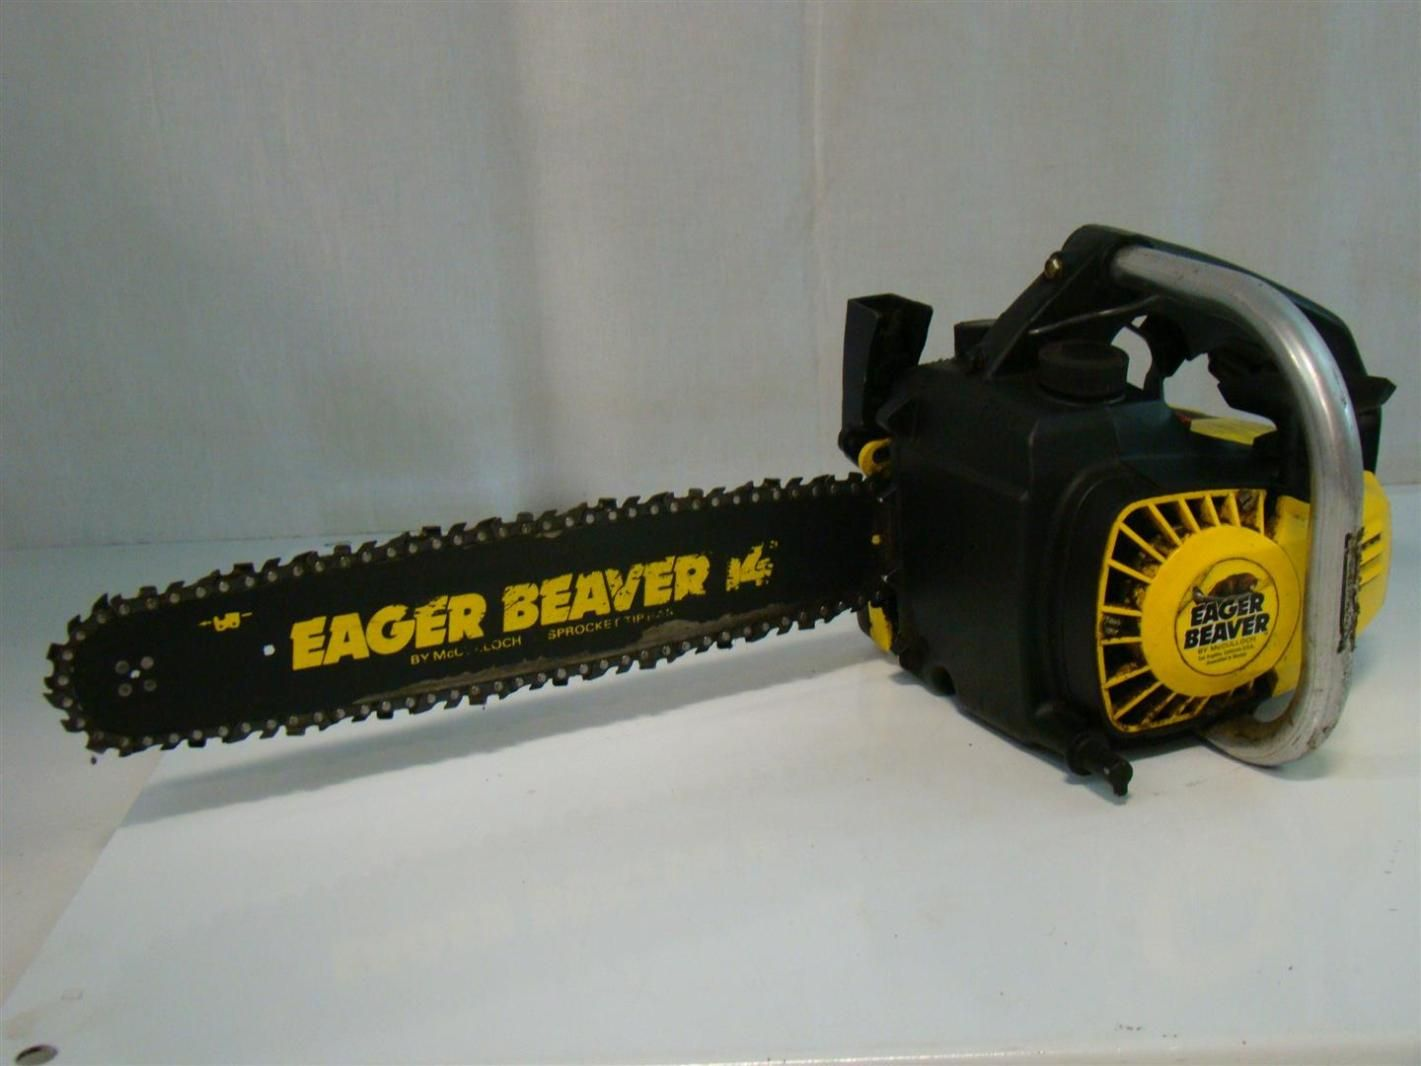 eager beaver 2.0 cid manual